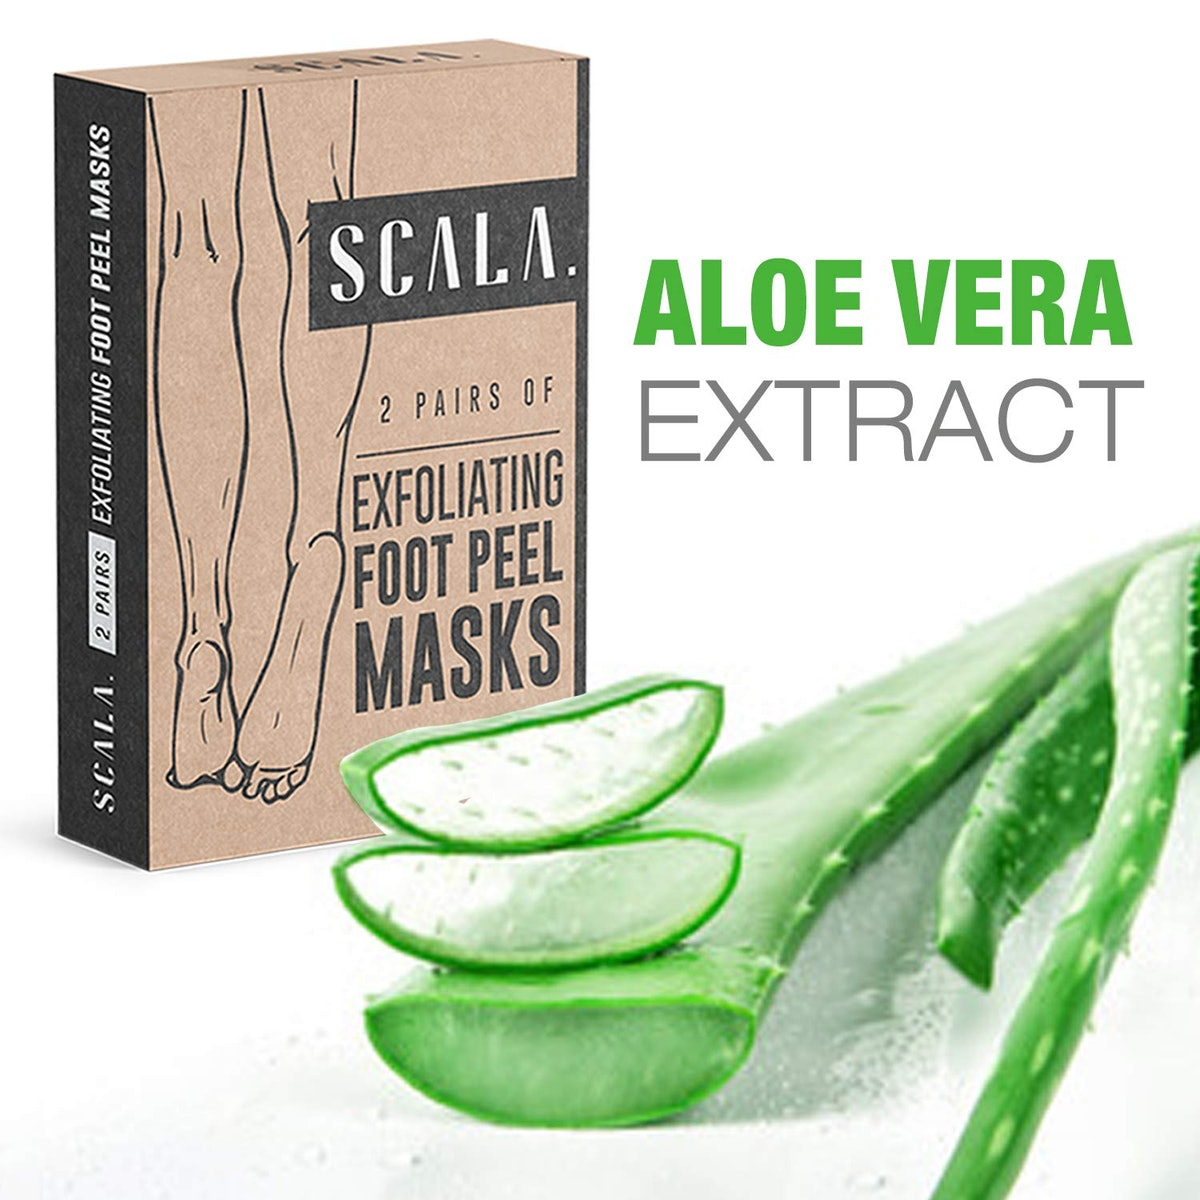 Scala Foot Peel Exfoliating Masks (2 Pairs)